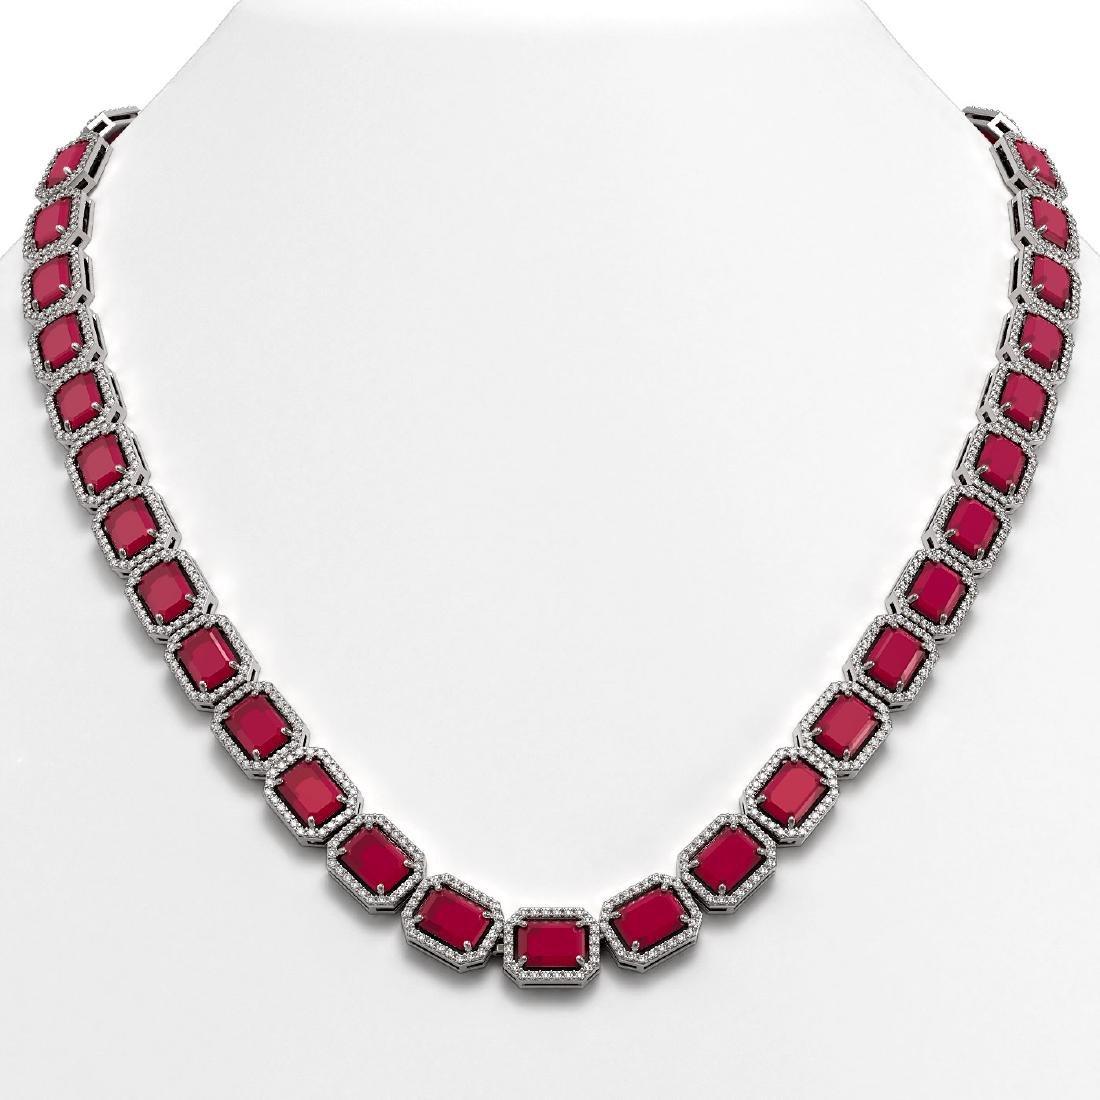 58.59 CTW Ruby & Diamond Halo Necklace 10K White Gold